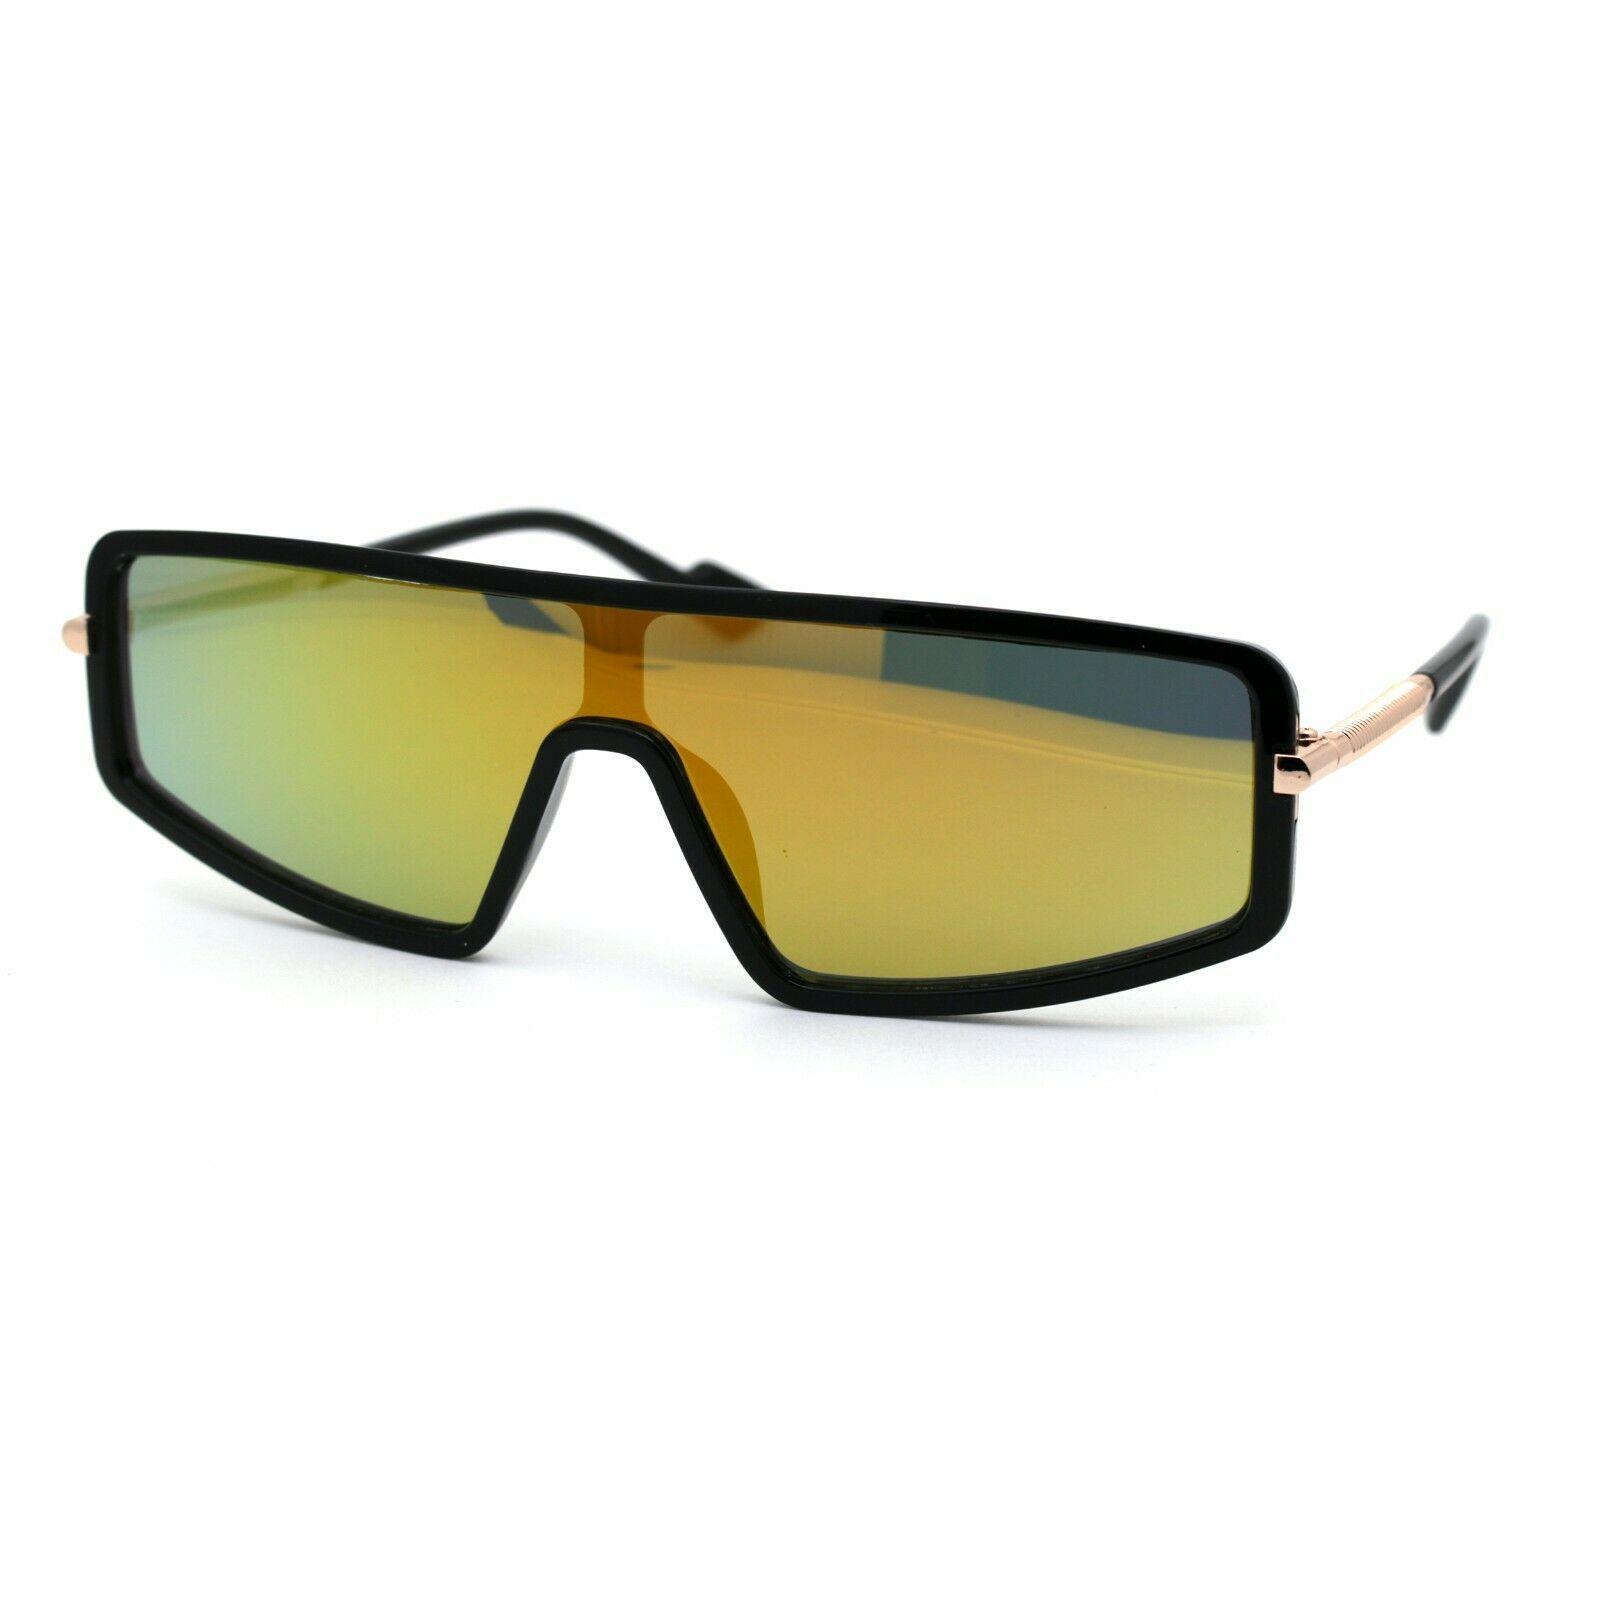 Luxury Shield Narrow Designer Plastic Robotic Sunglasses